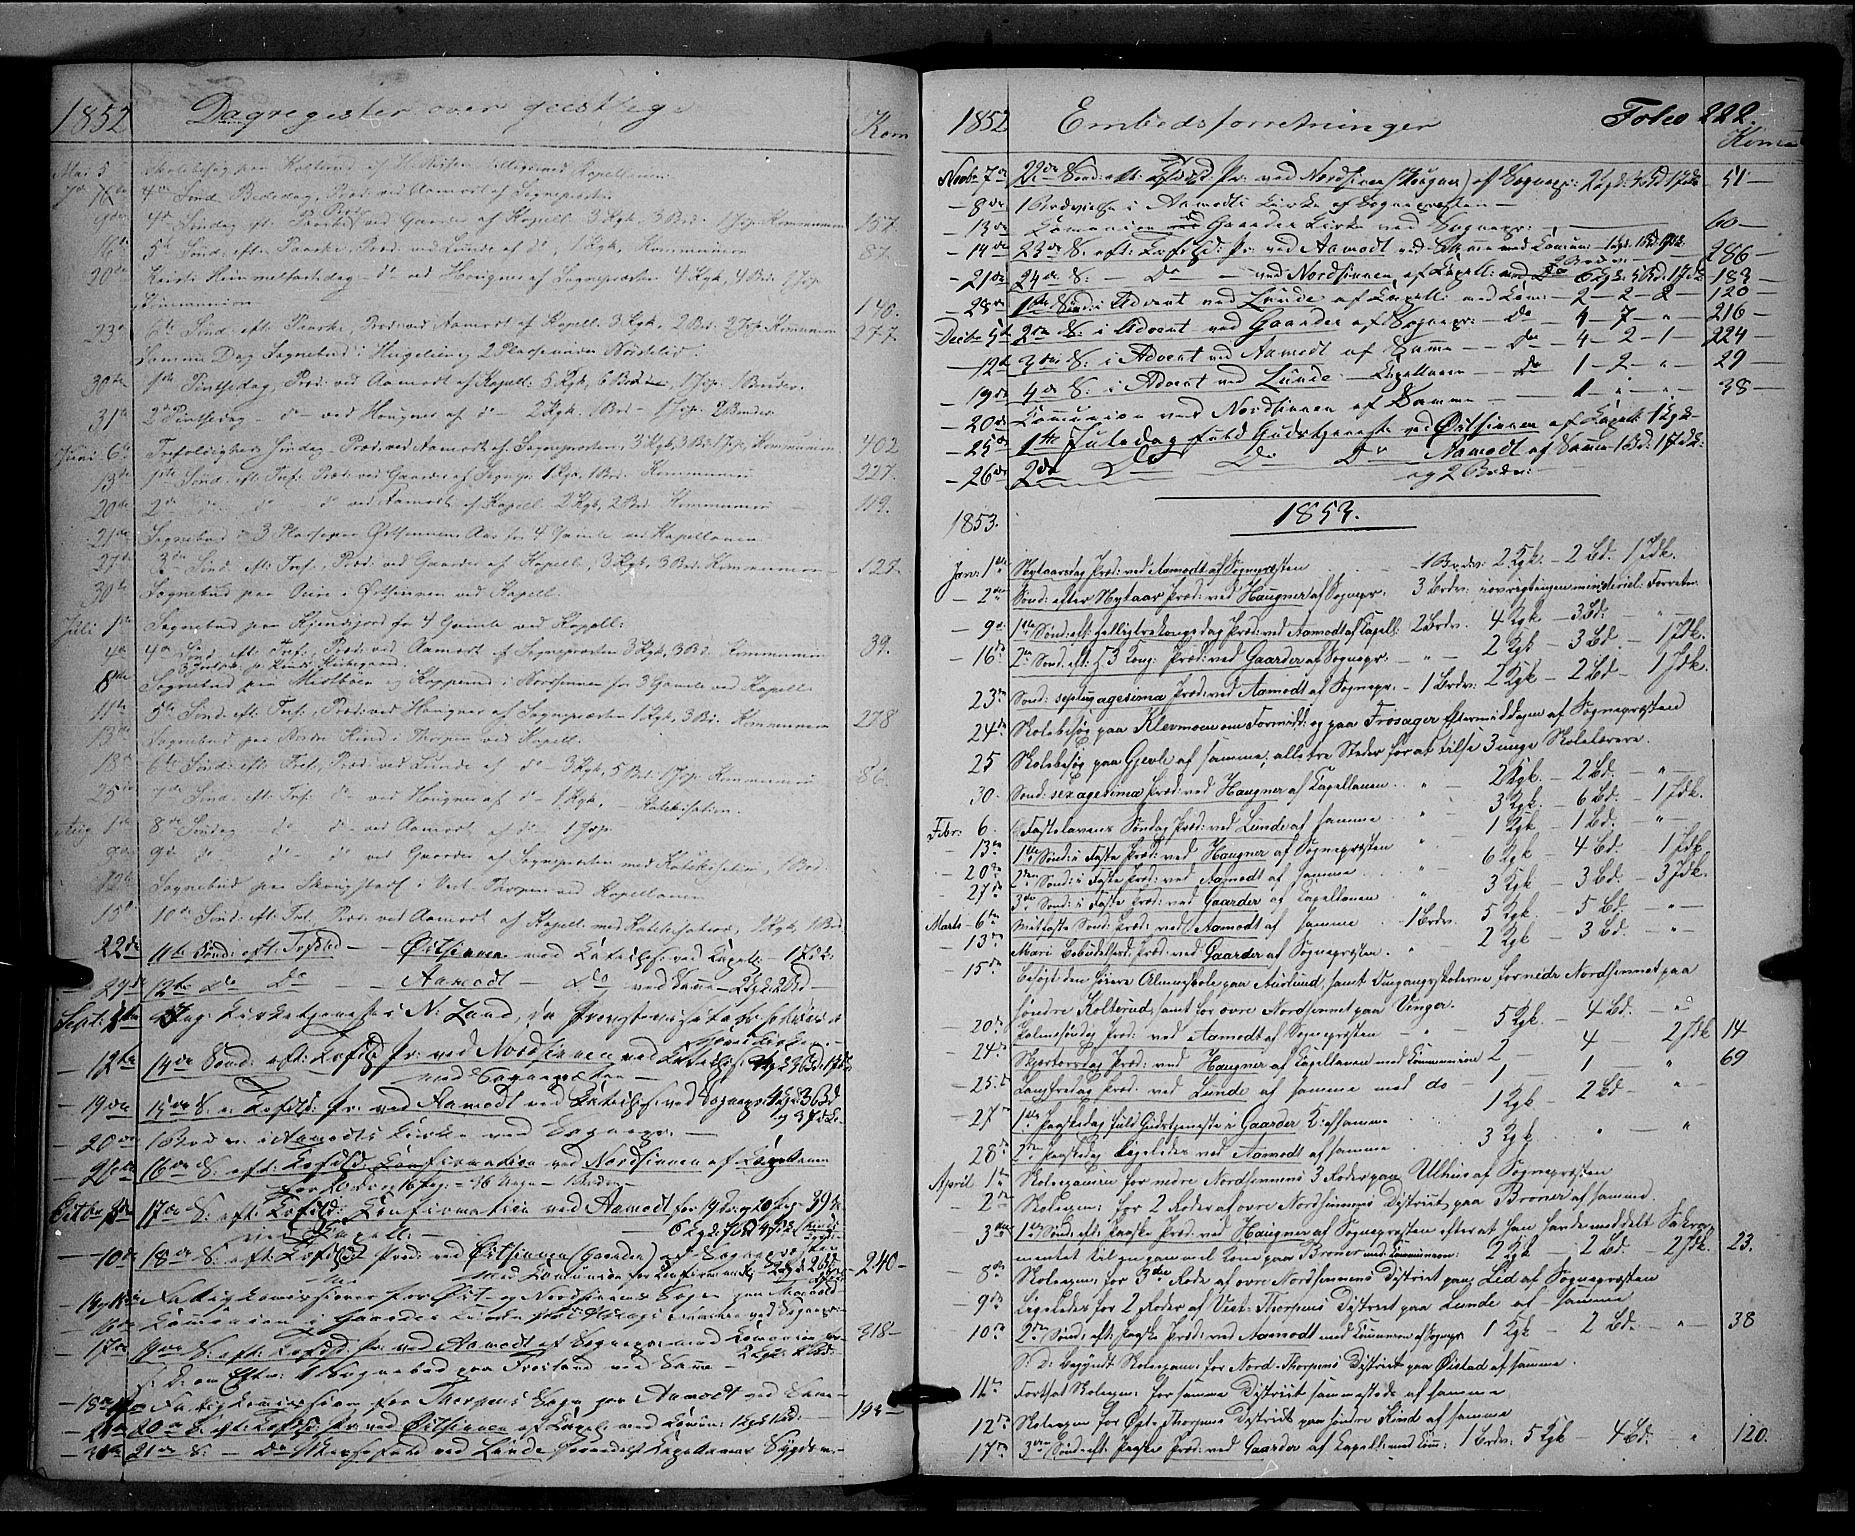 SAH, Land prestekontor, Ministerialbok nr. 10, 1847-1859, s. 222